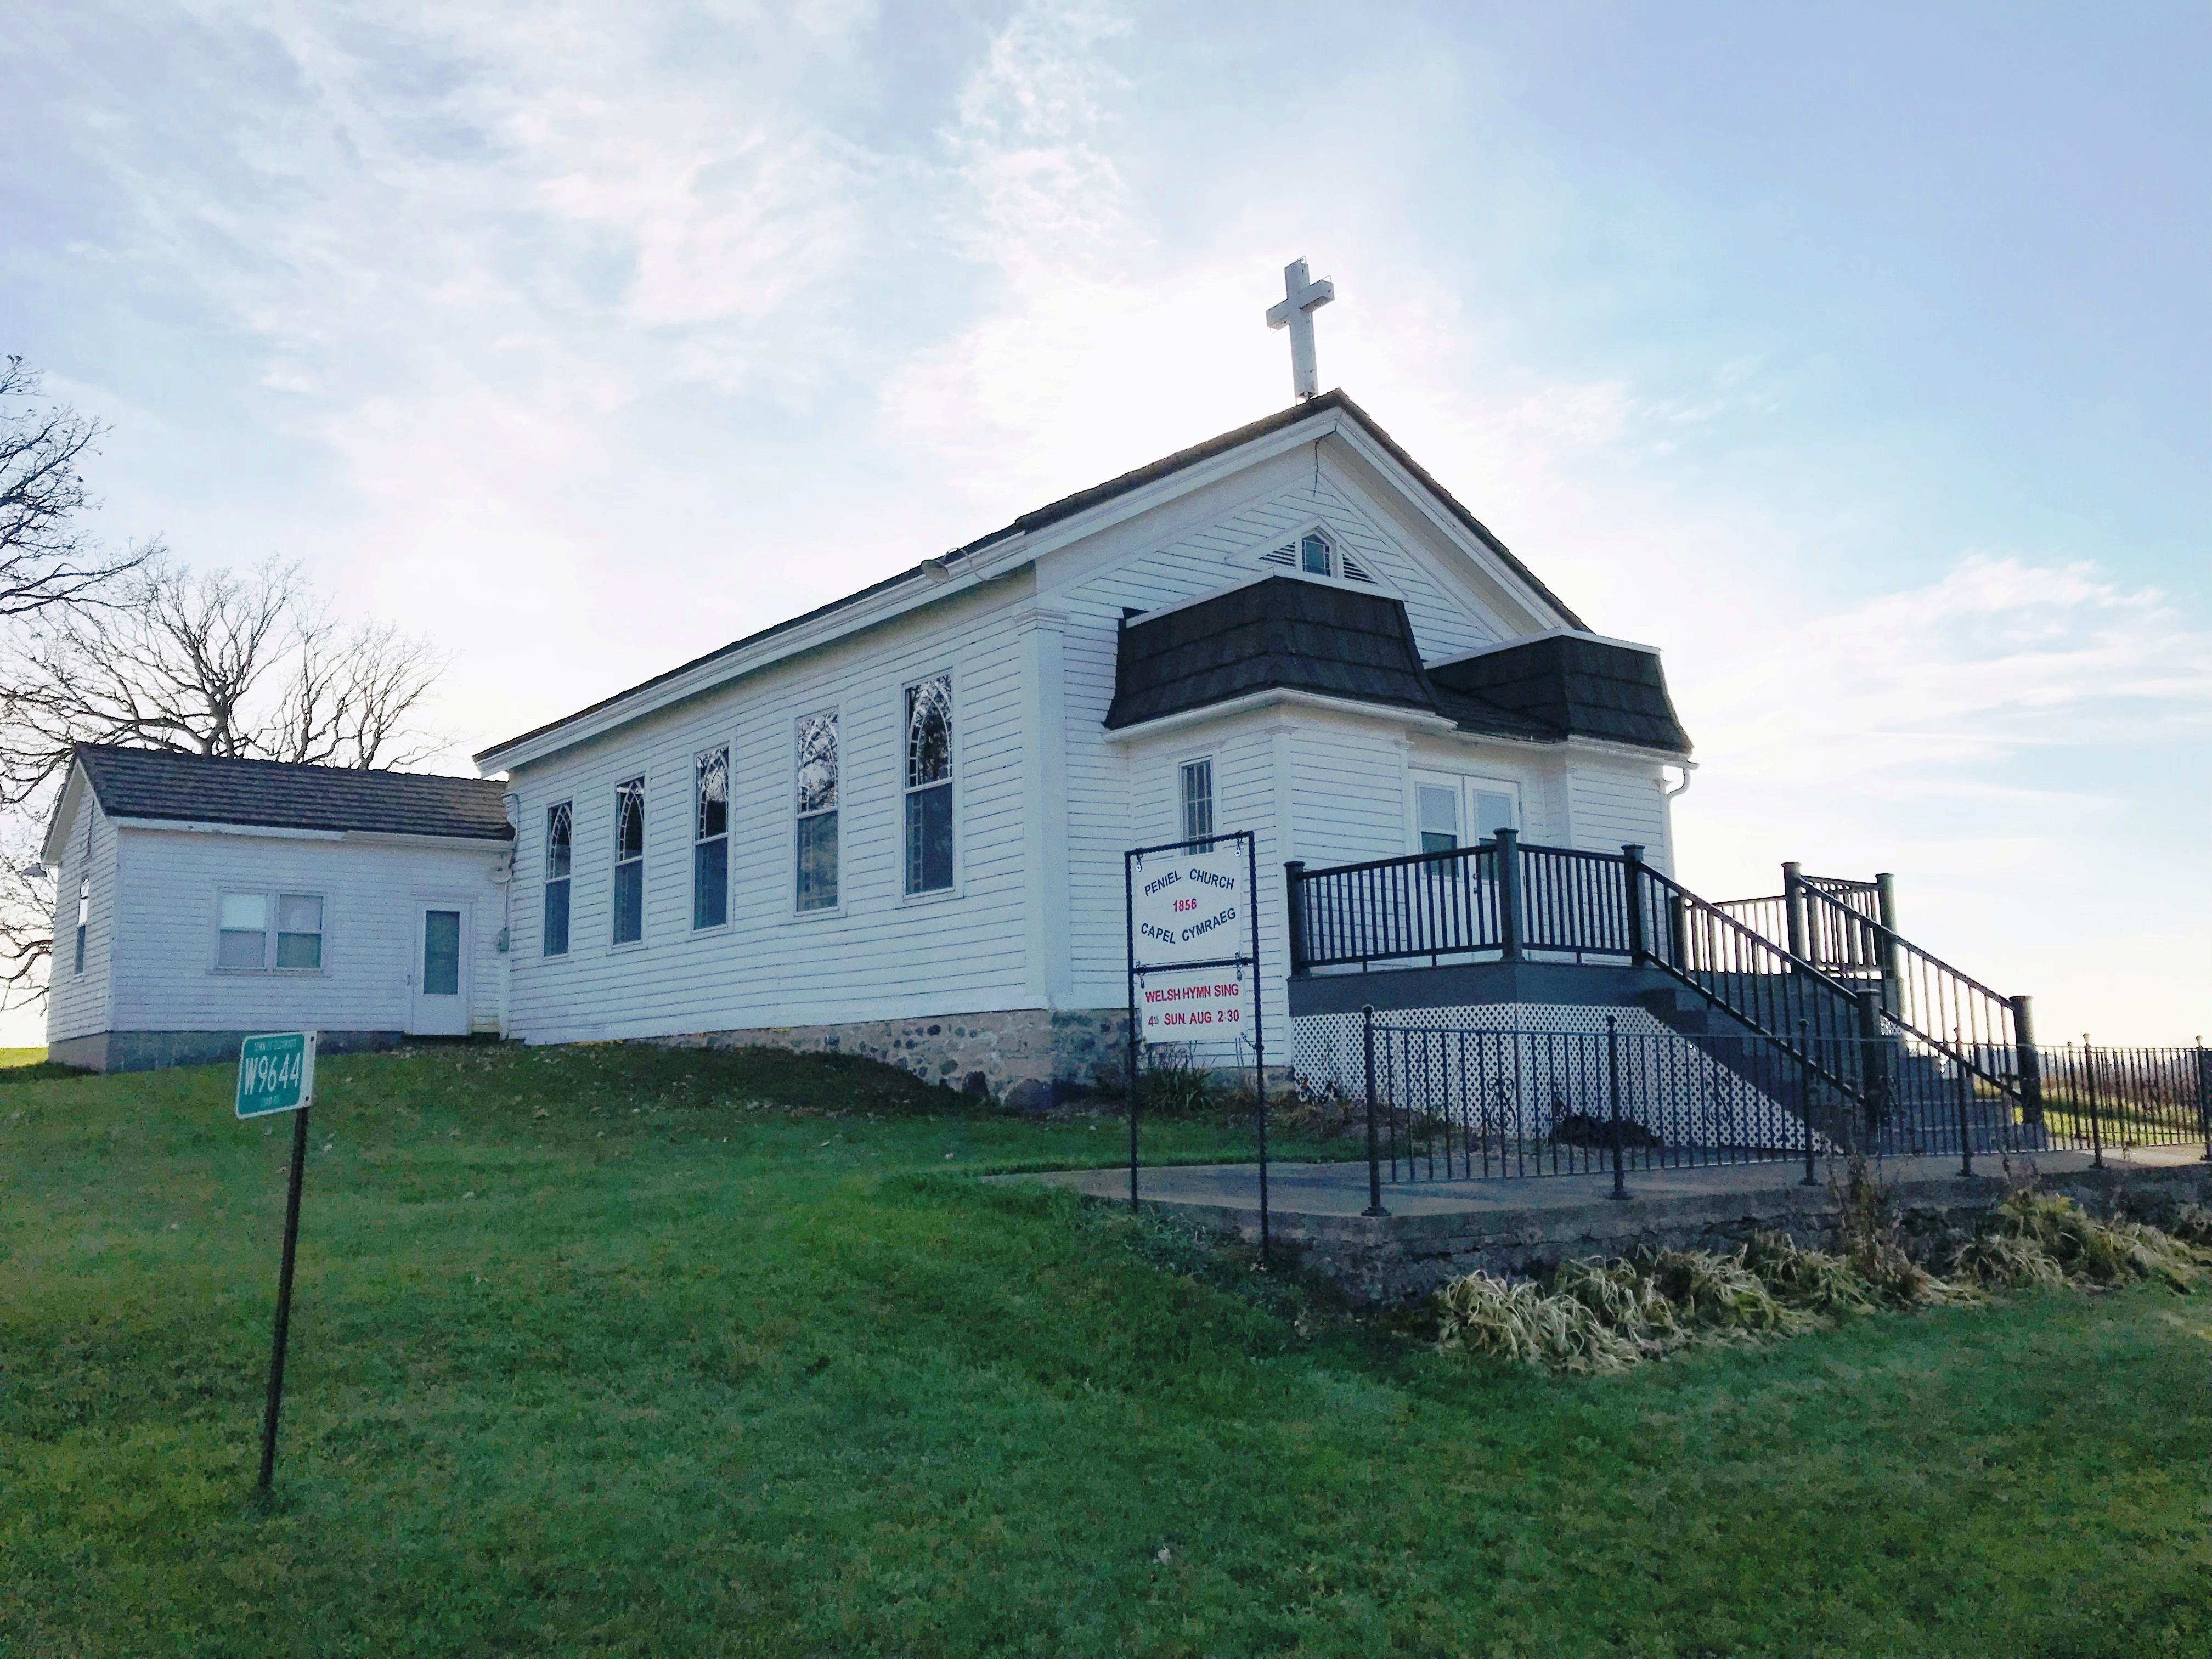 History of Welsh chapel, settlement May 16